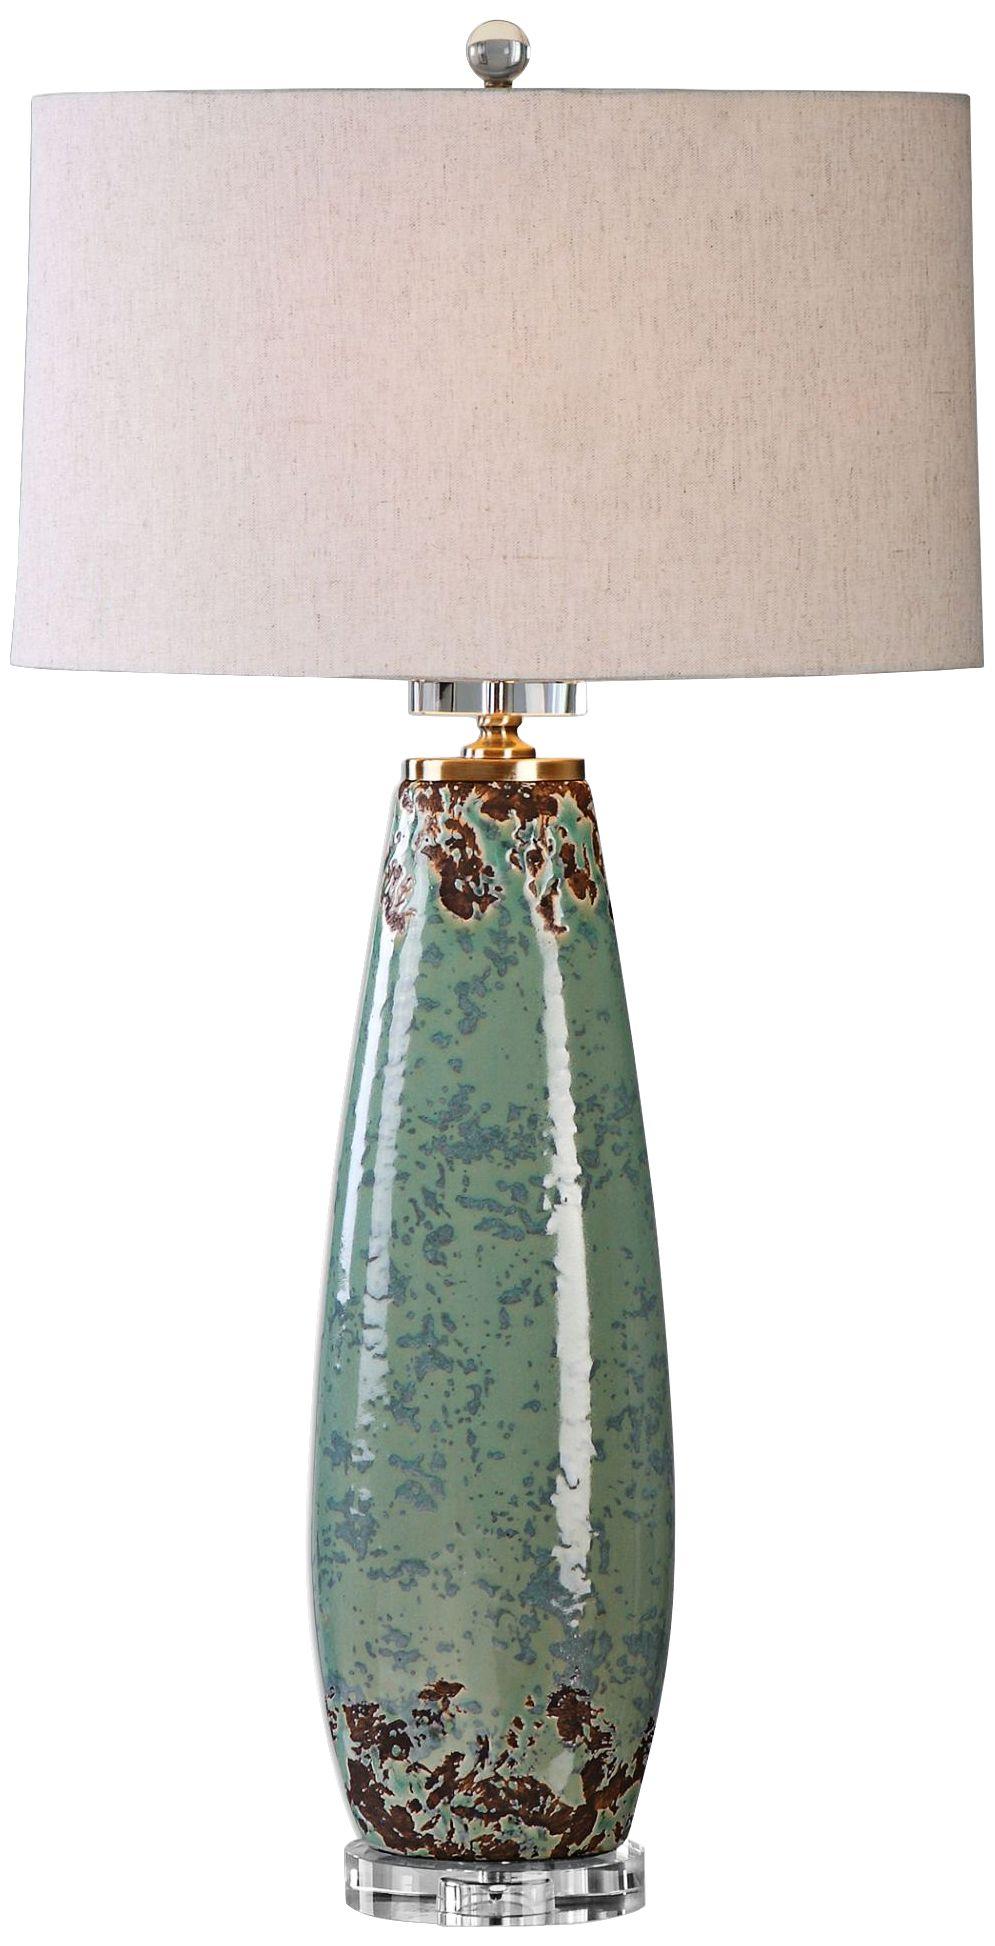 uttermost rovasenda pale mint green ceramic table lamp